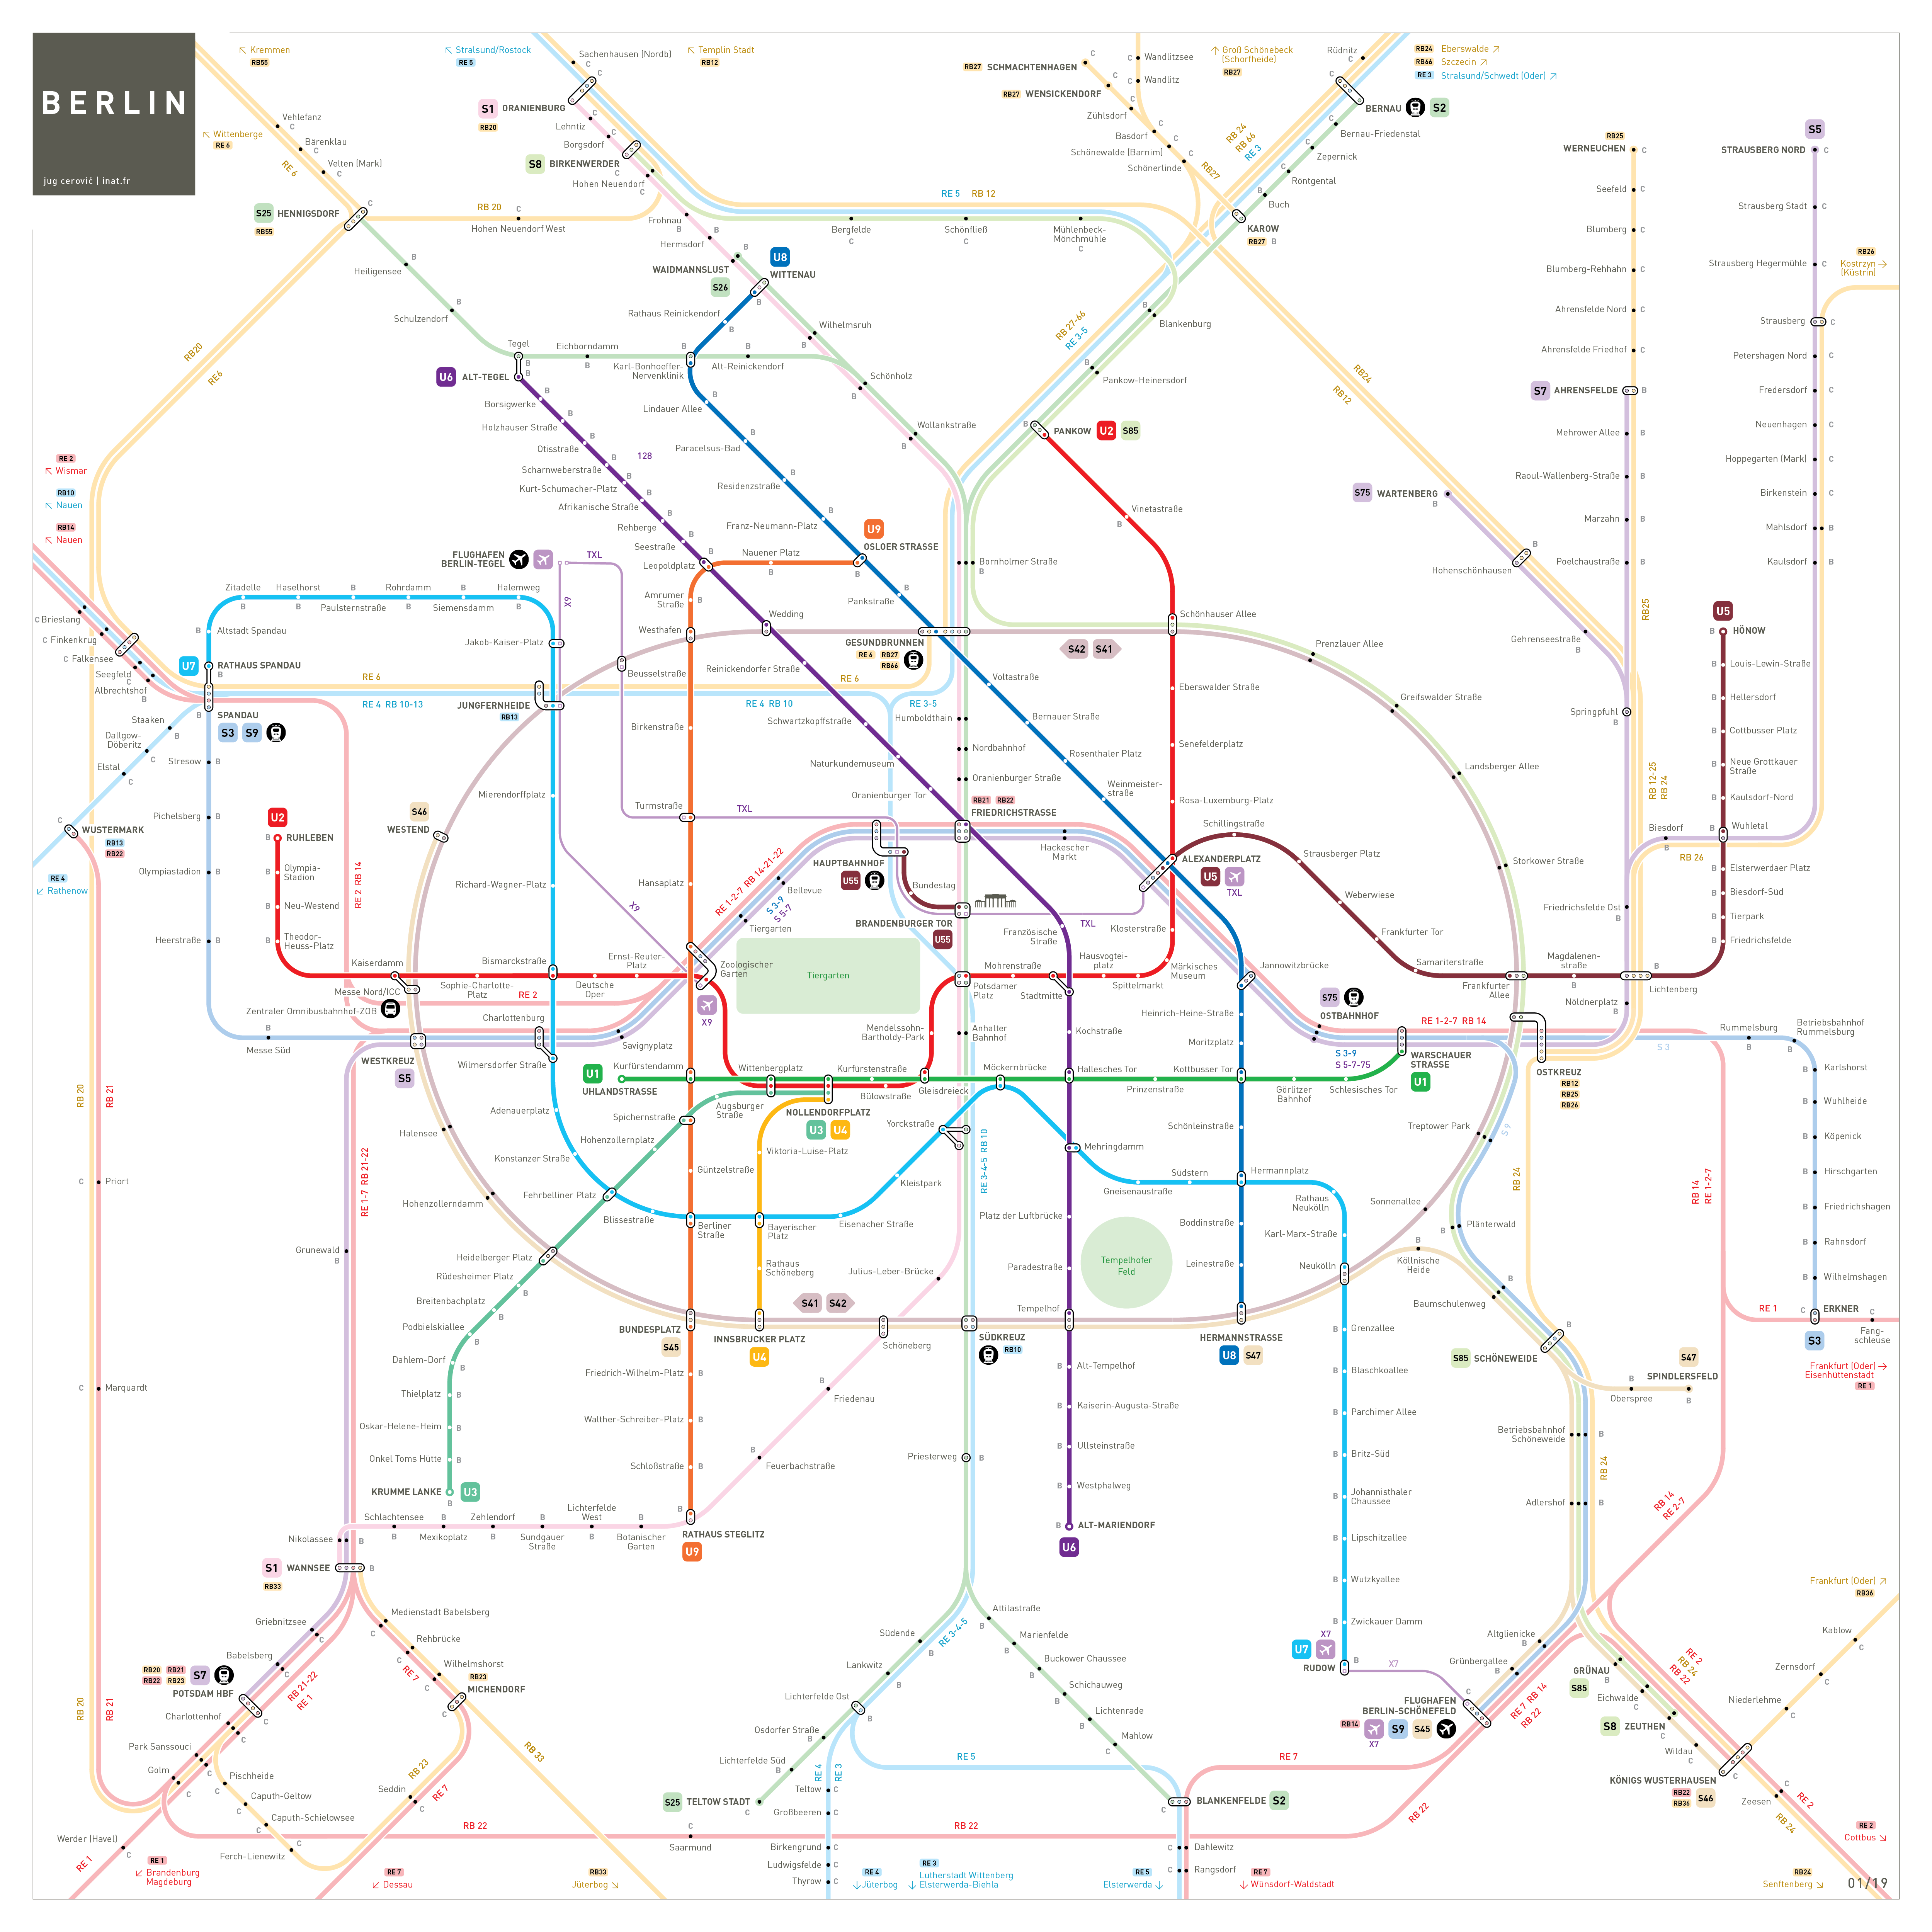 Ideal Berlin S-Bahn U-Bahn Map : inat NB05